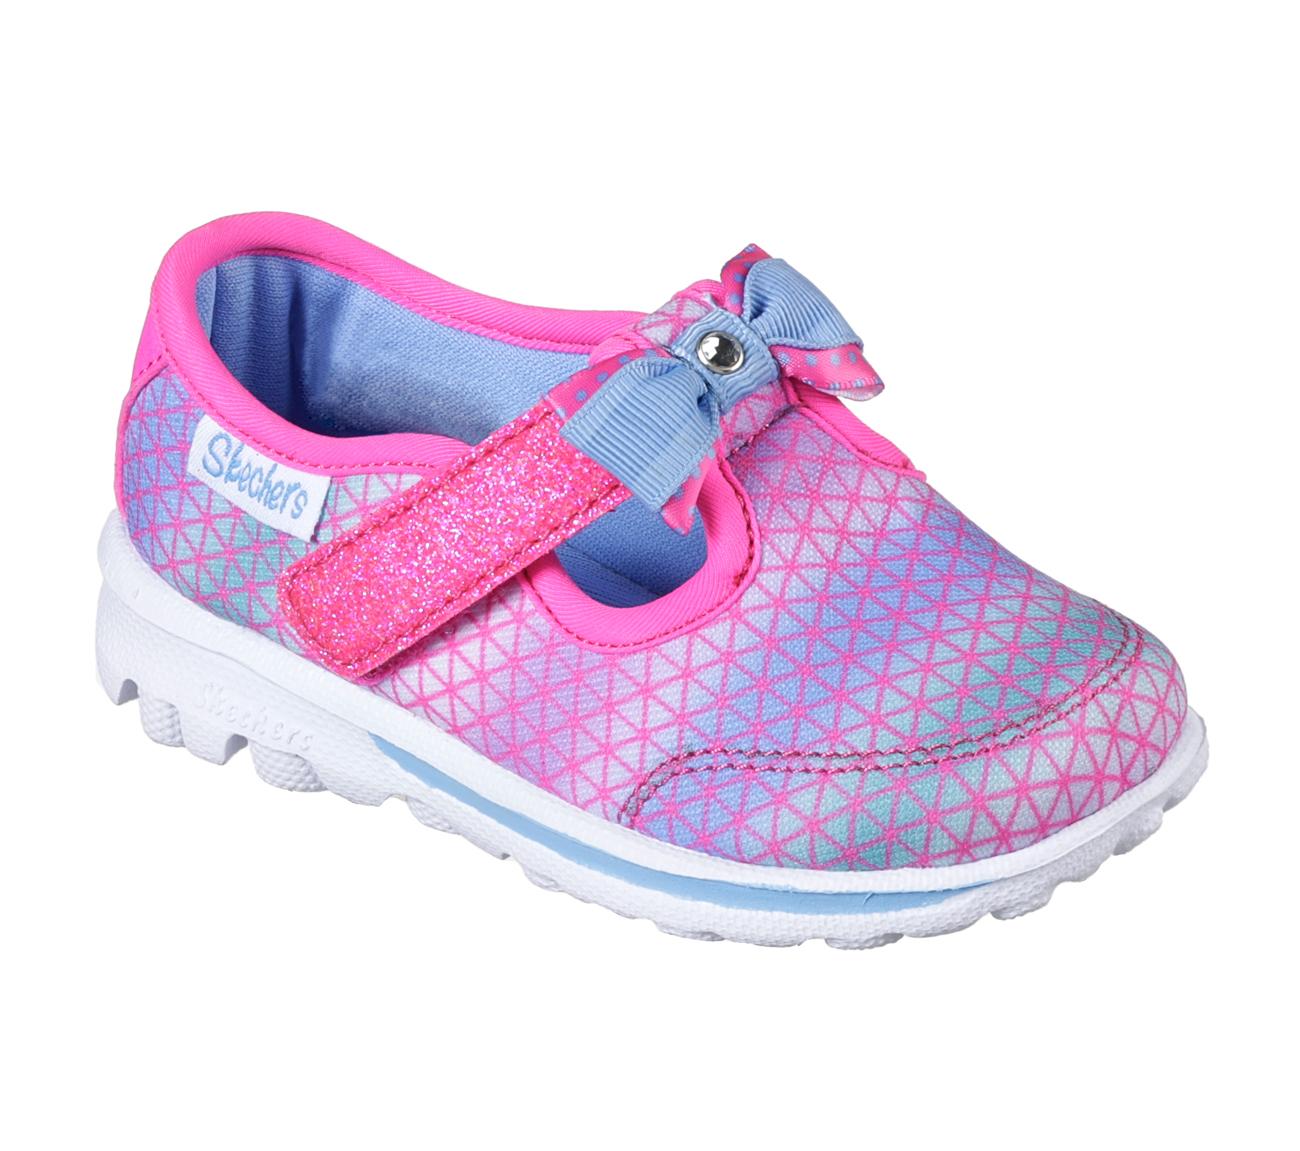 Skechers Gowalk  Girls Slip On Shoes Pink Multi